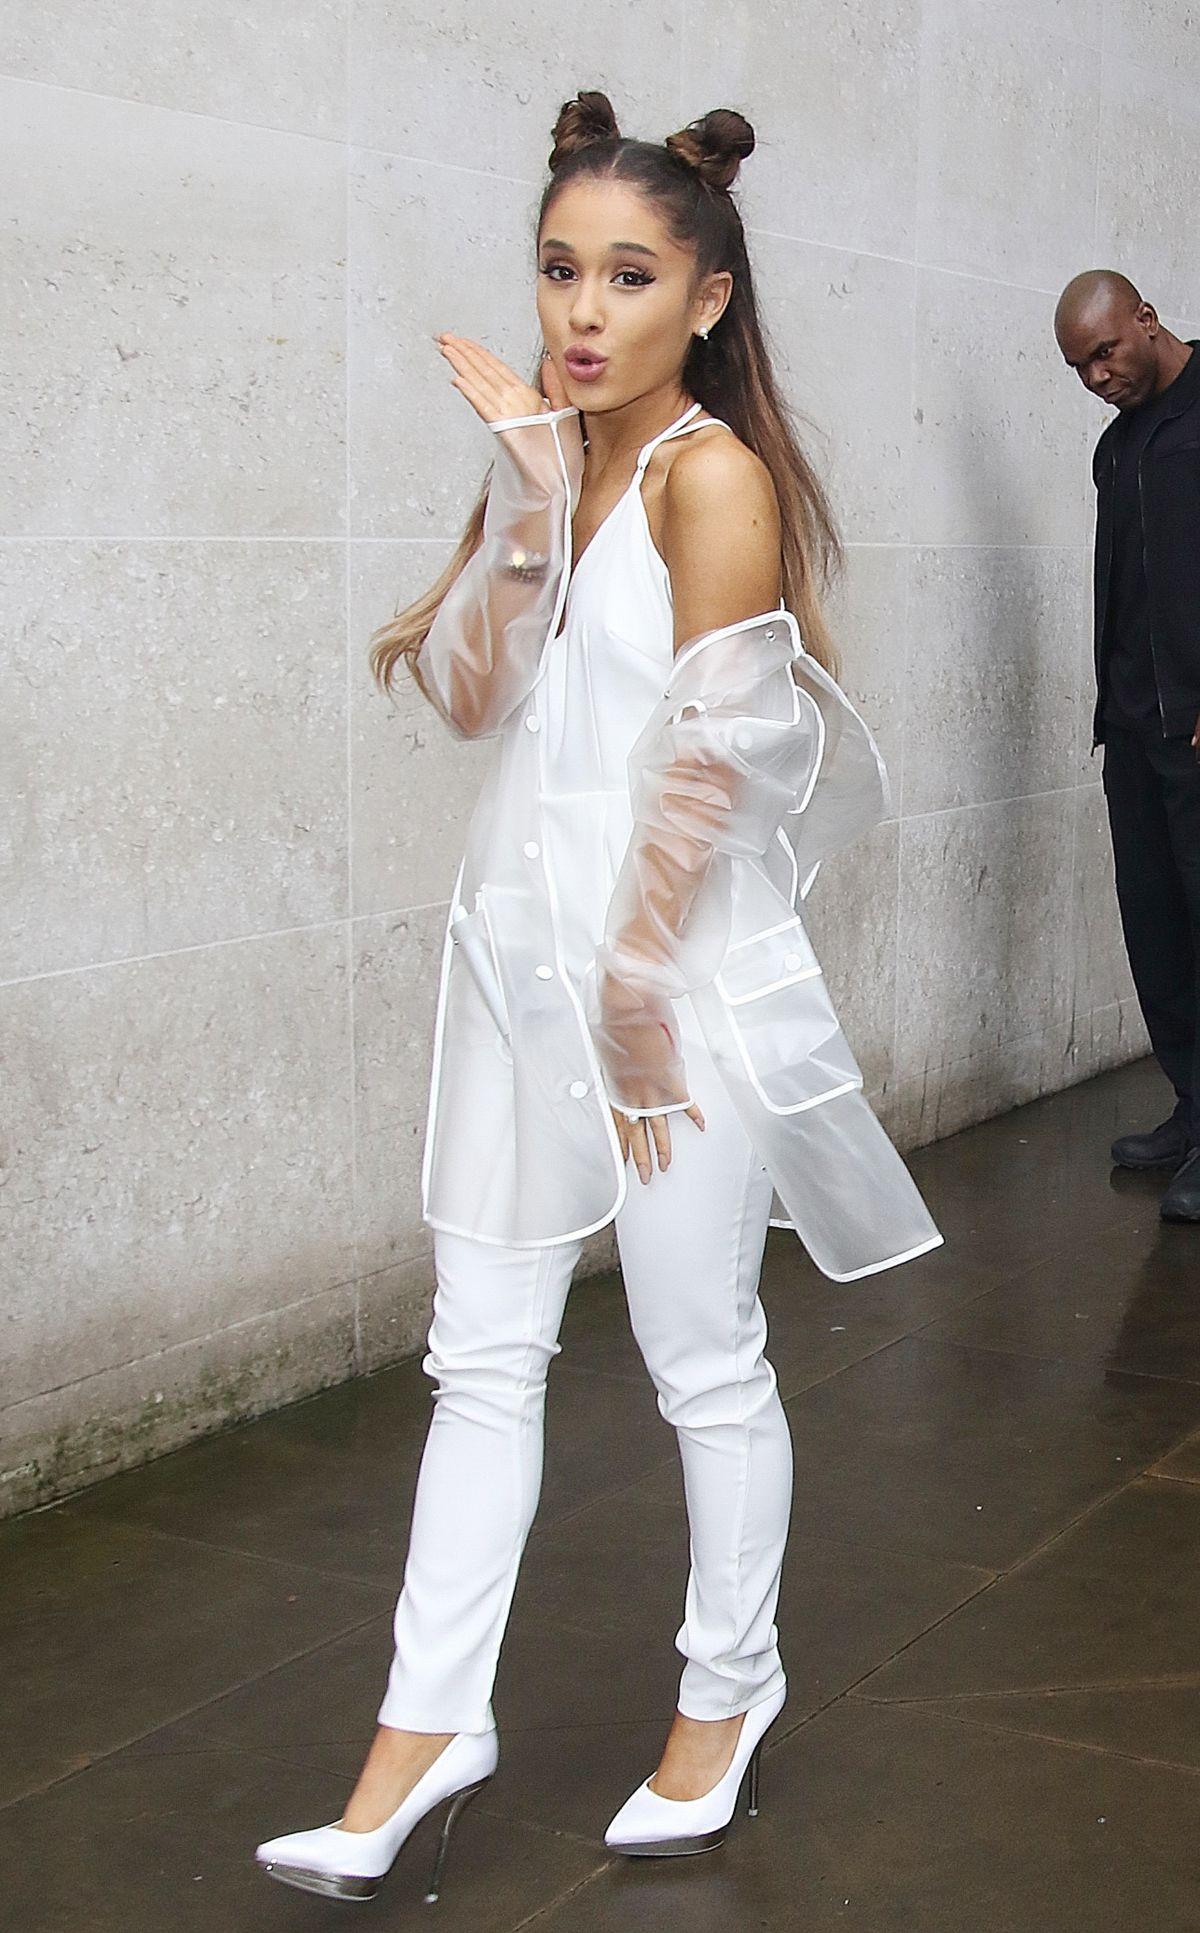 ARIANA GRANDE Arrives at BBC 1 Studios in London 11/04/2015